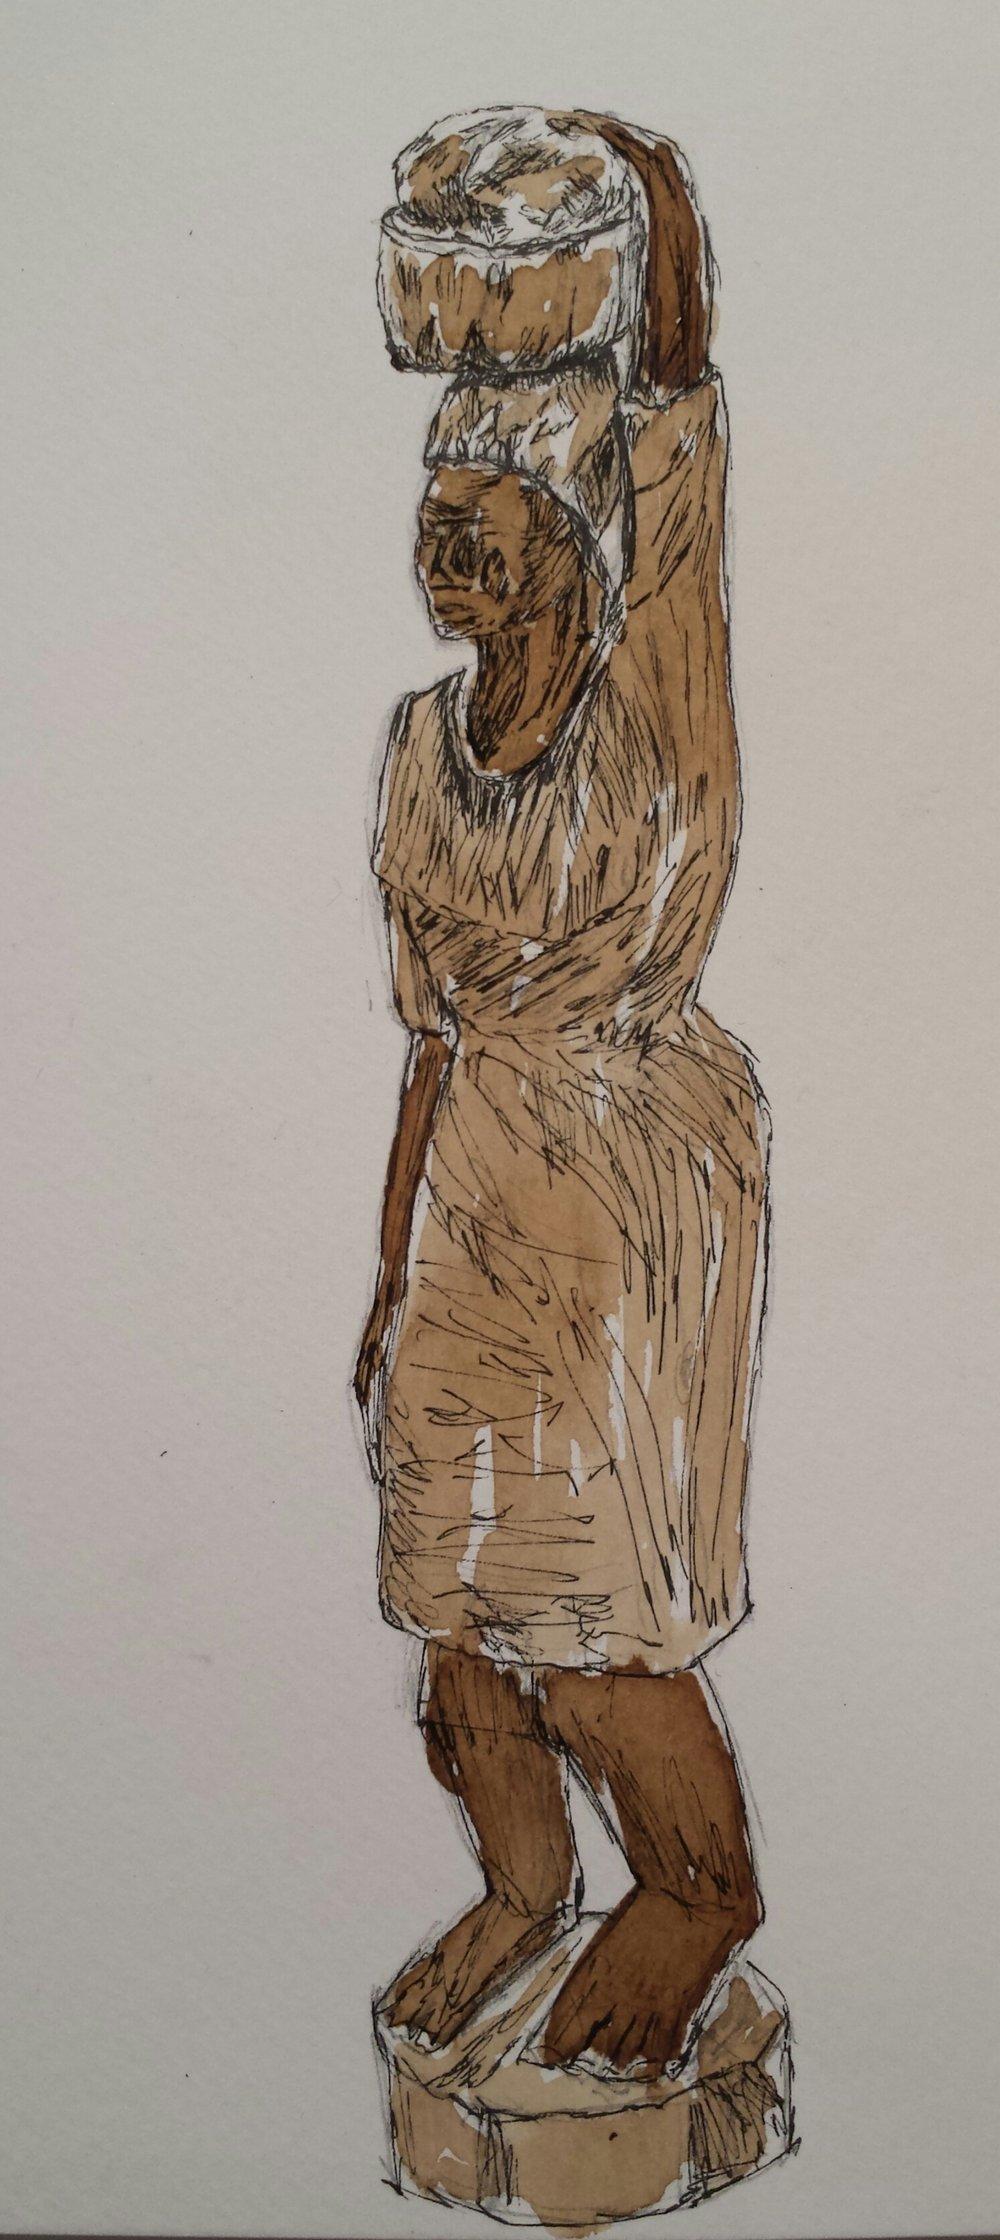 Haitian Sculpture, Pen and walnut ink, 2016.